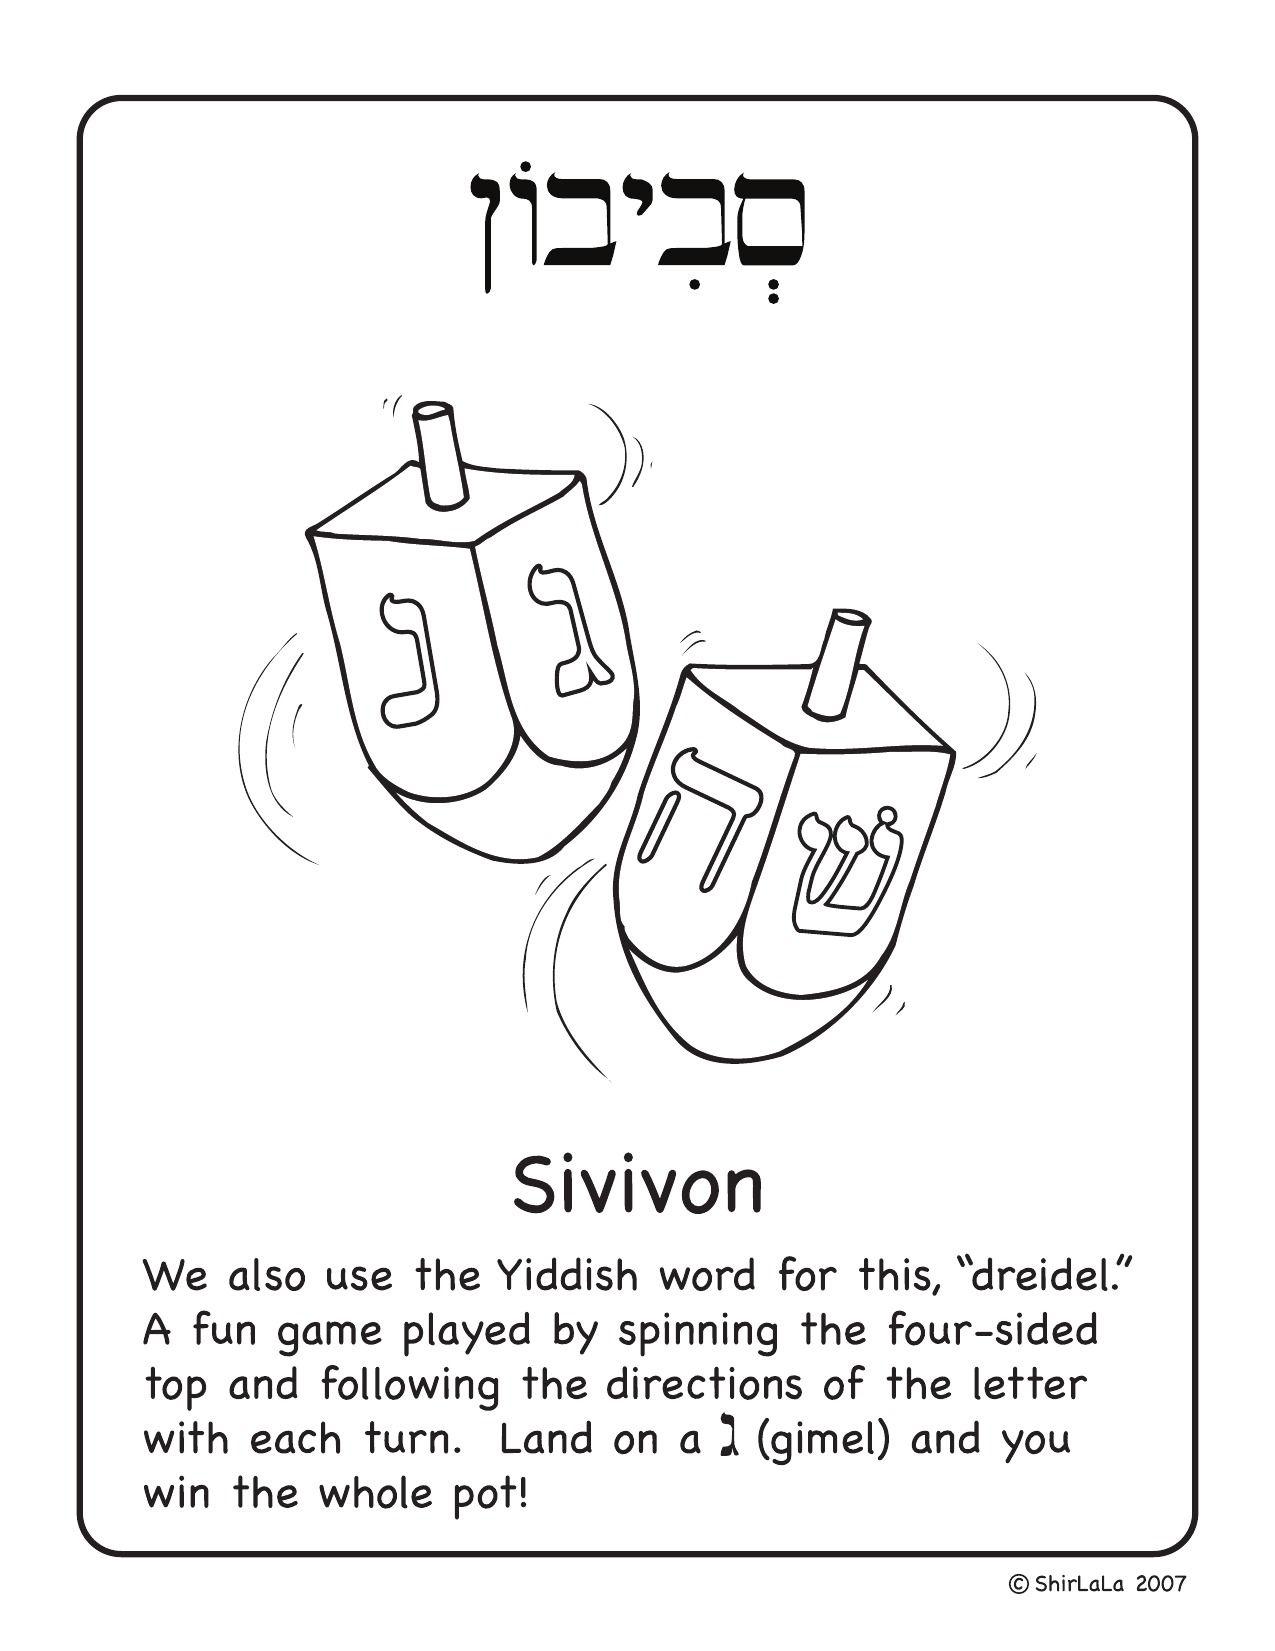 Sivivon (Dreidel) Hebrew Coloring Page for Chanukah on